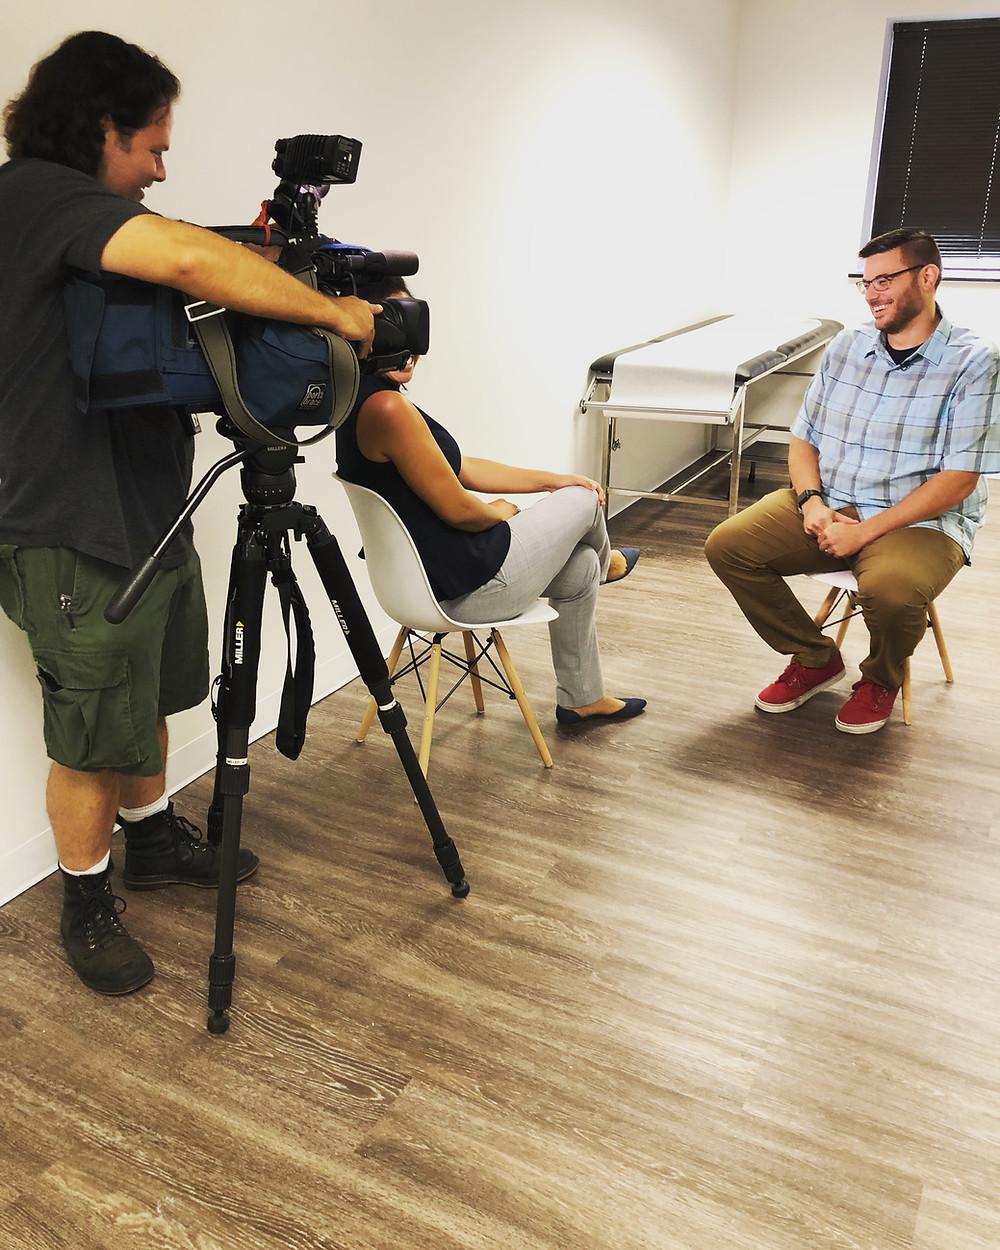 Randy Shaffer, Patient and Marketing Manager at Ohio Marijuana Card